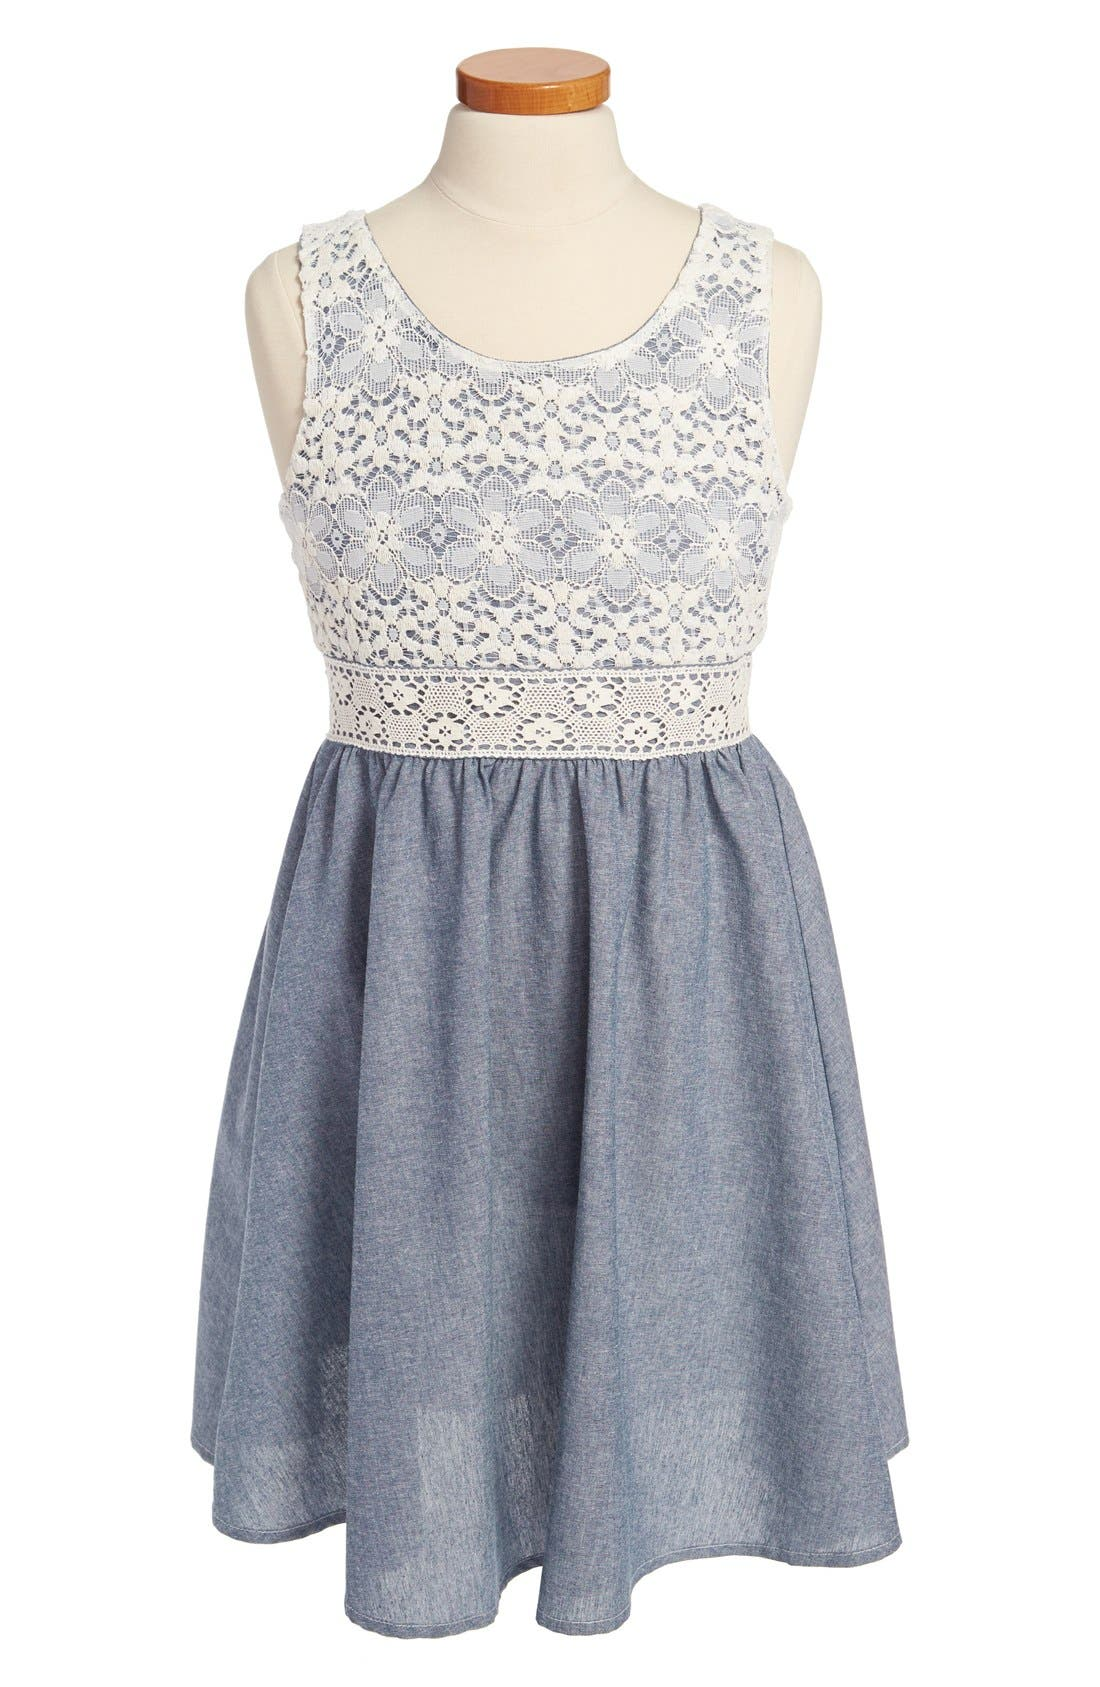 Alternate Image 1 Selected - Zunie Lace Chambray Dress (Big Girls)